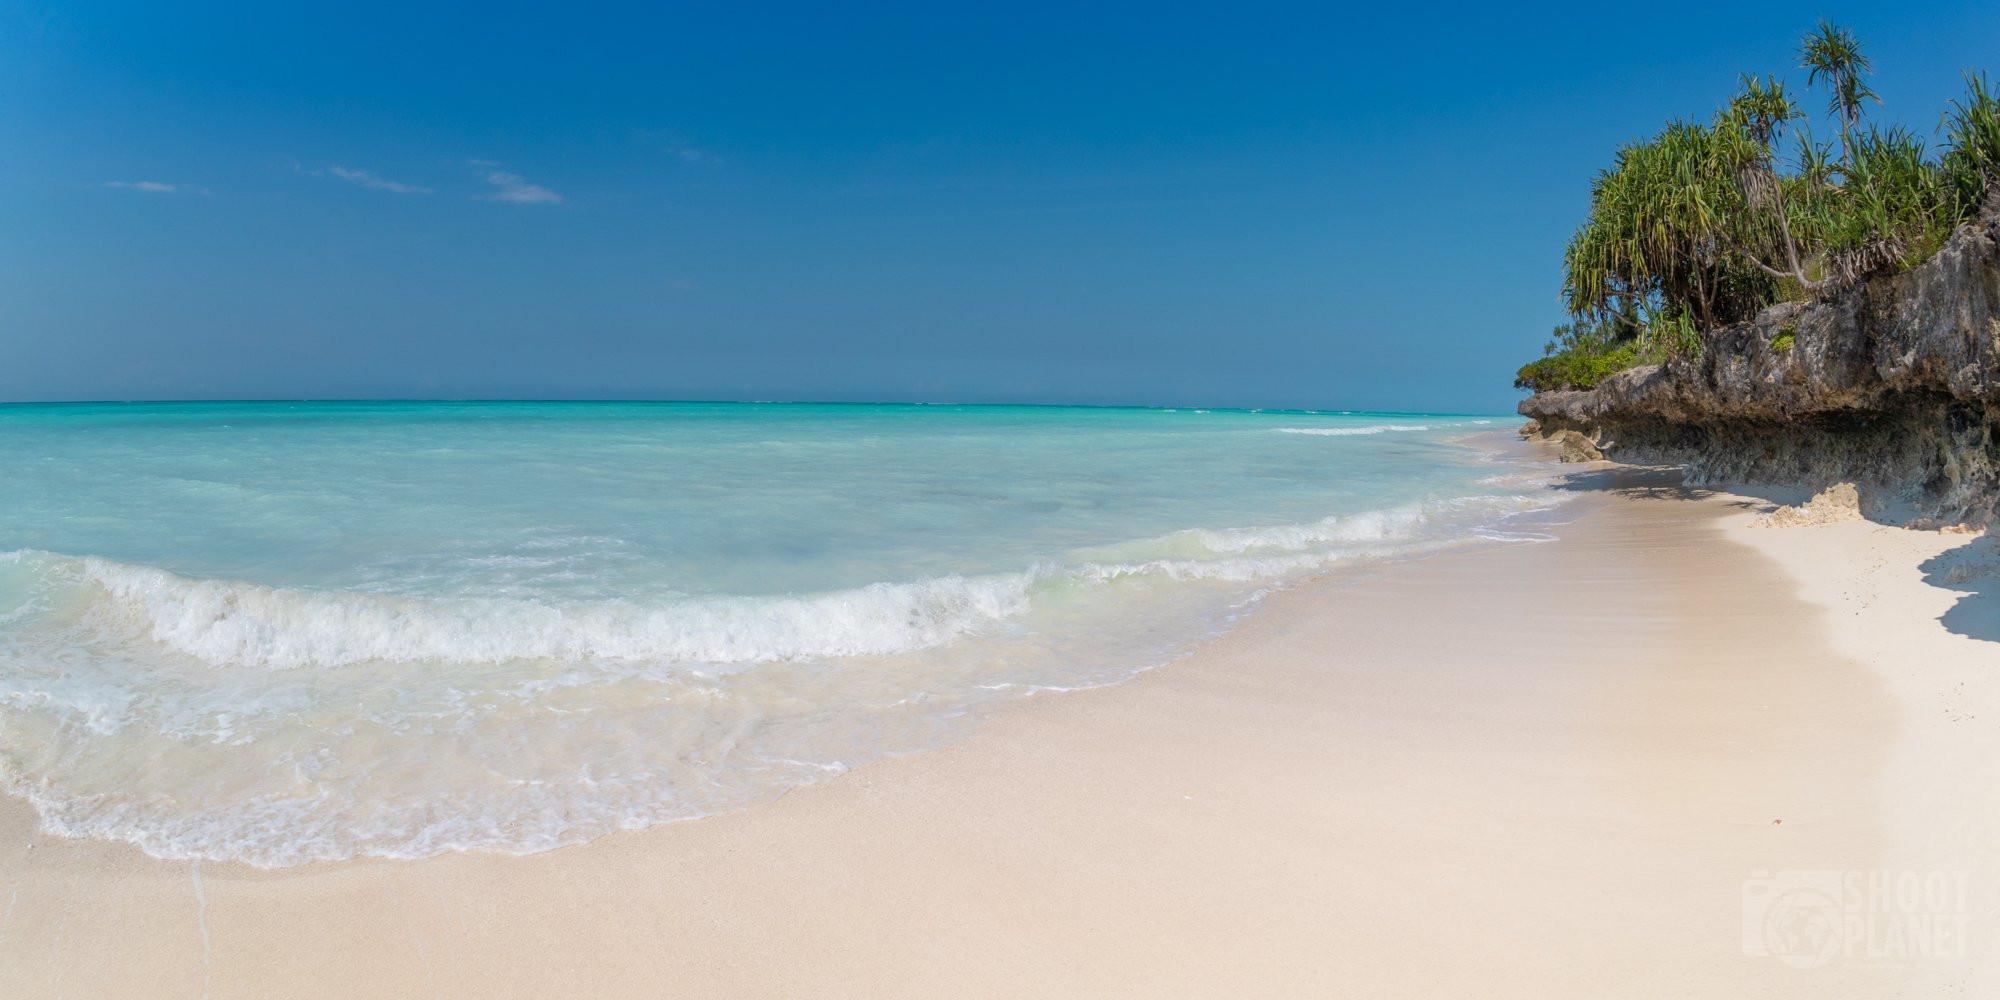 Ras Nungwi deserted beach, Zanzibar Tanzania